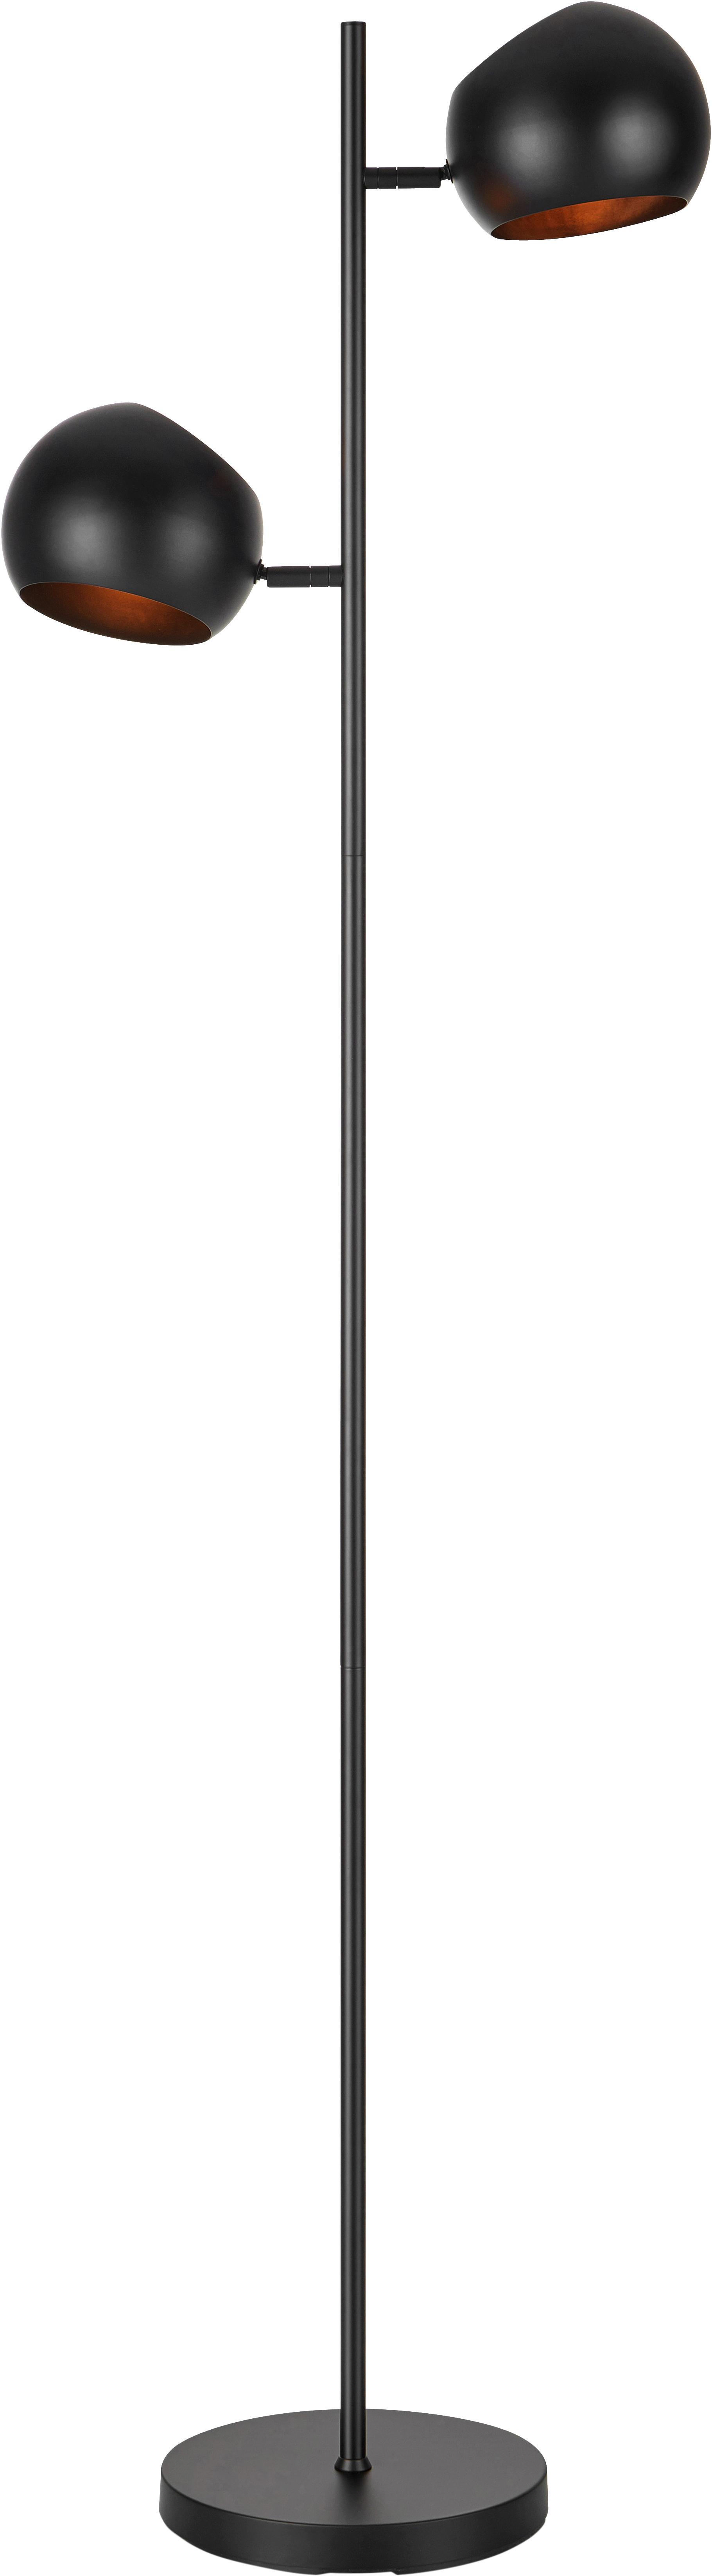 Lámpara de pie Edgar, Pantalla: metal pintado, Cable: plástico, Negro, An 40 x Al 145 cm